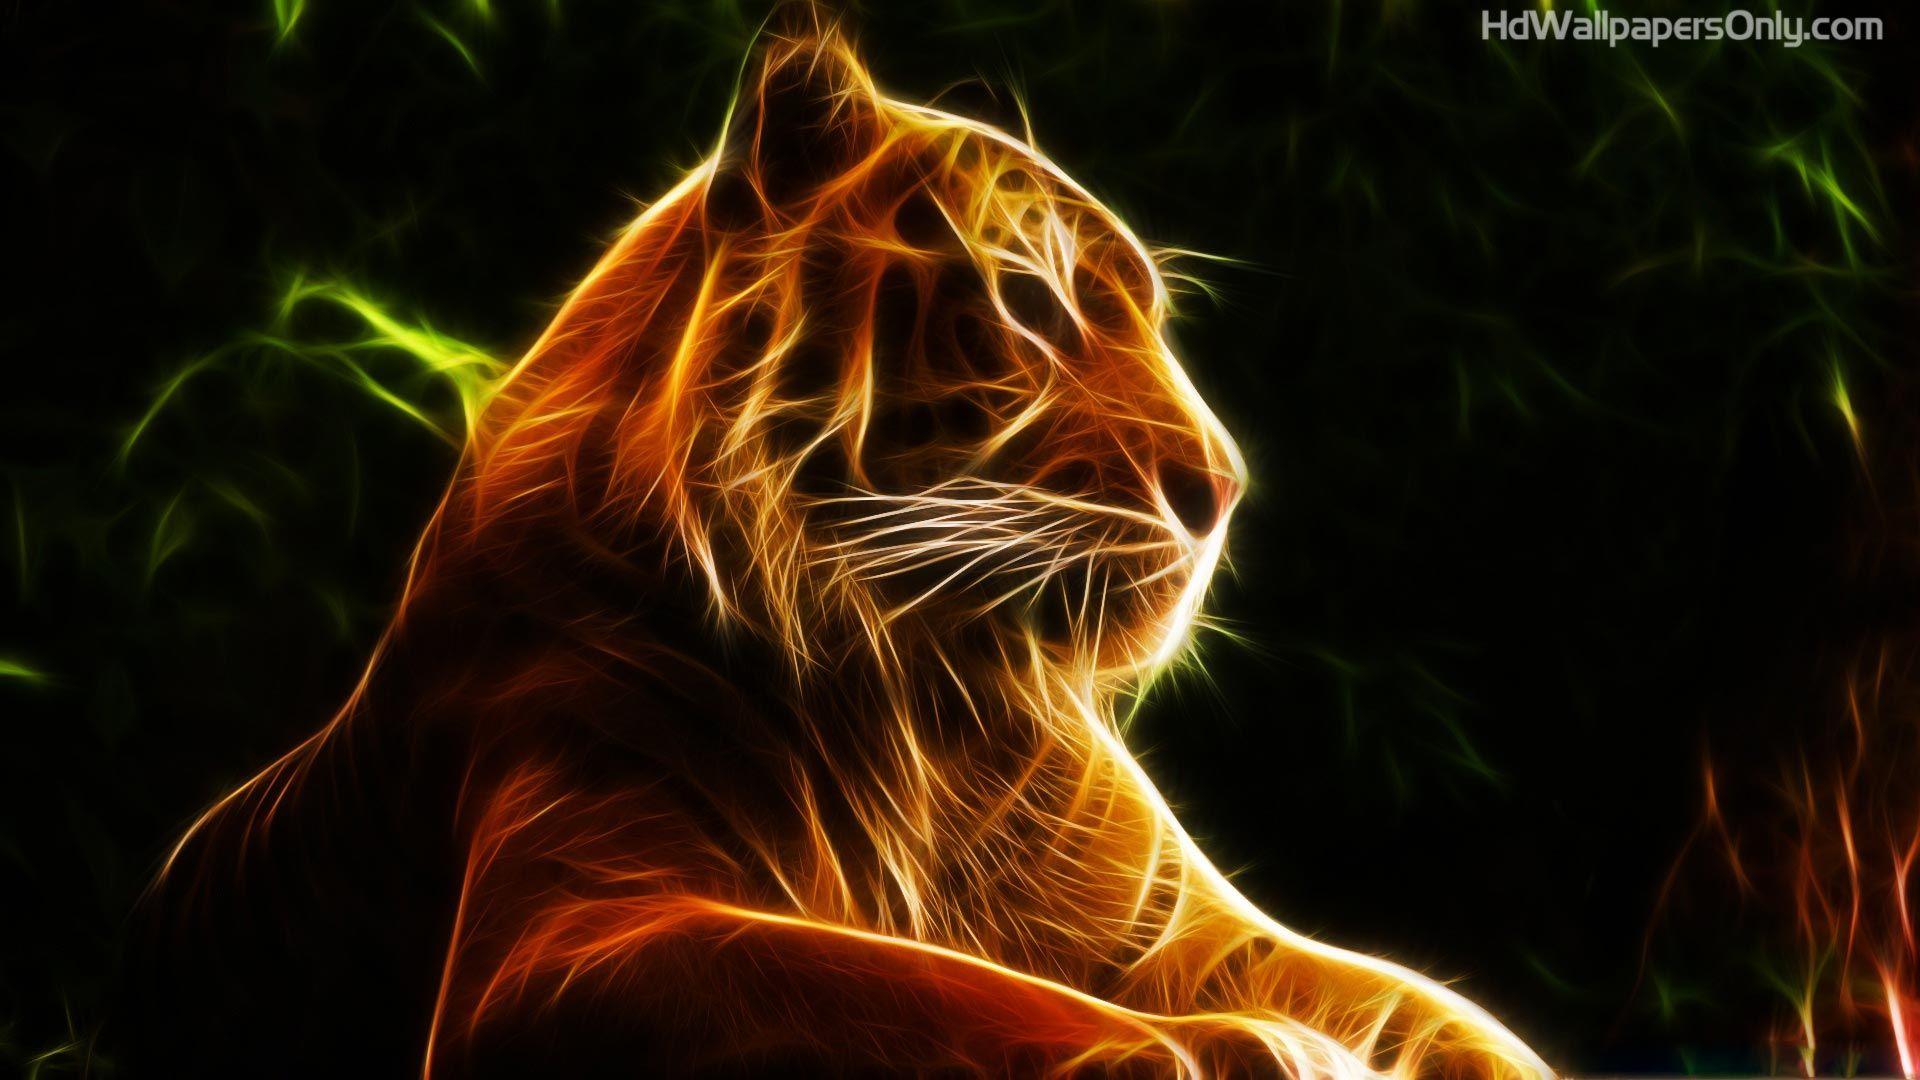 Animated wallpaper | Tiger wallpaper, Animals, Abstract animals